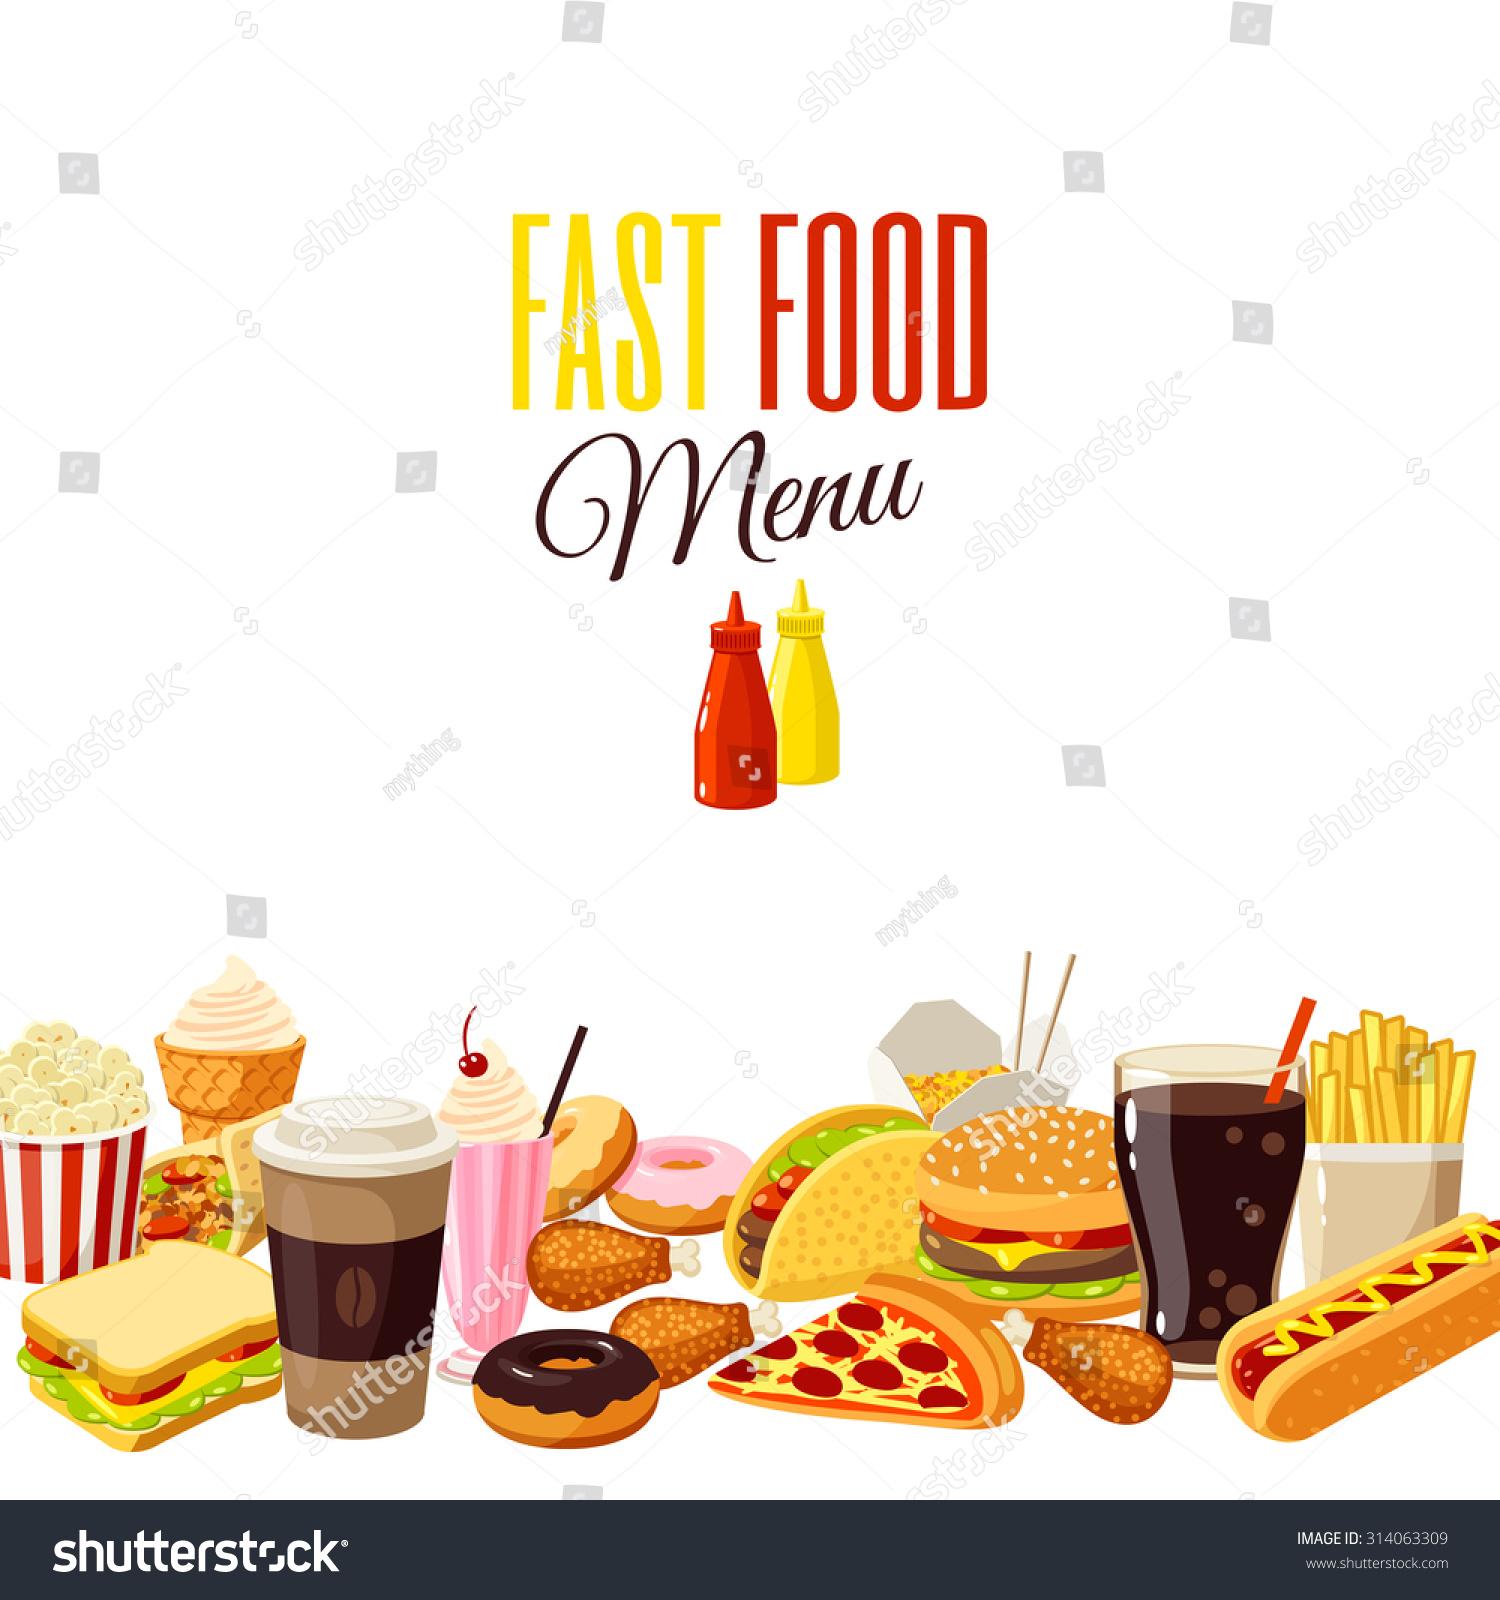 Ice Cream Sandwich Wallpaper: Background Cartoon Food Hamburger French Fries Stock